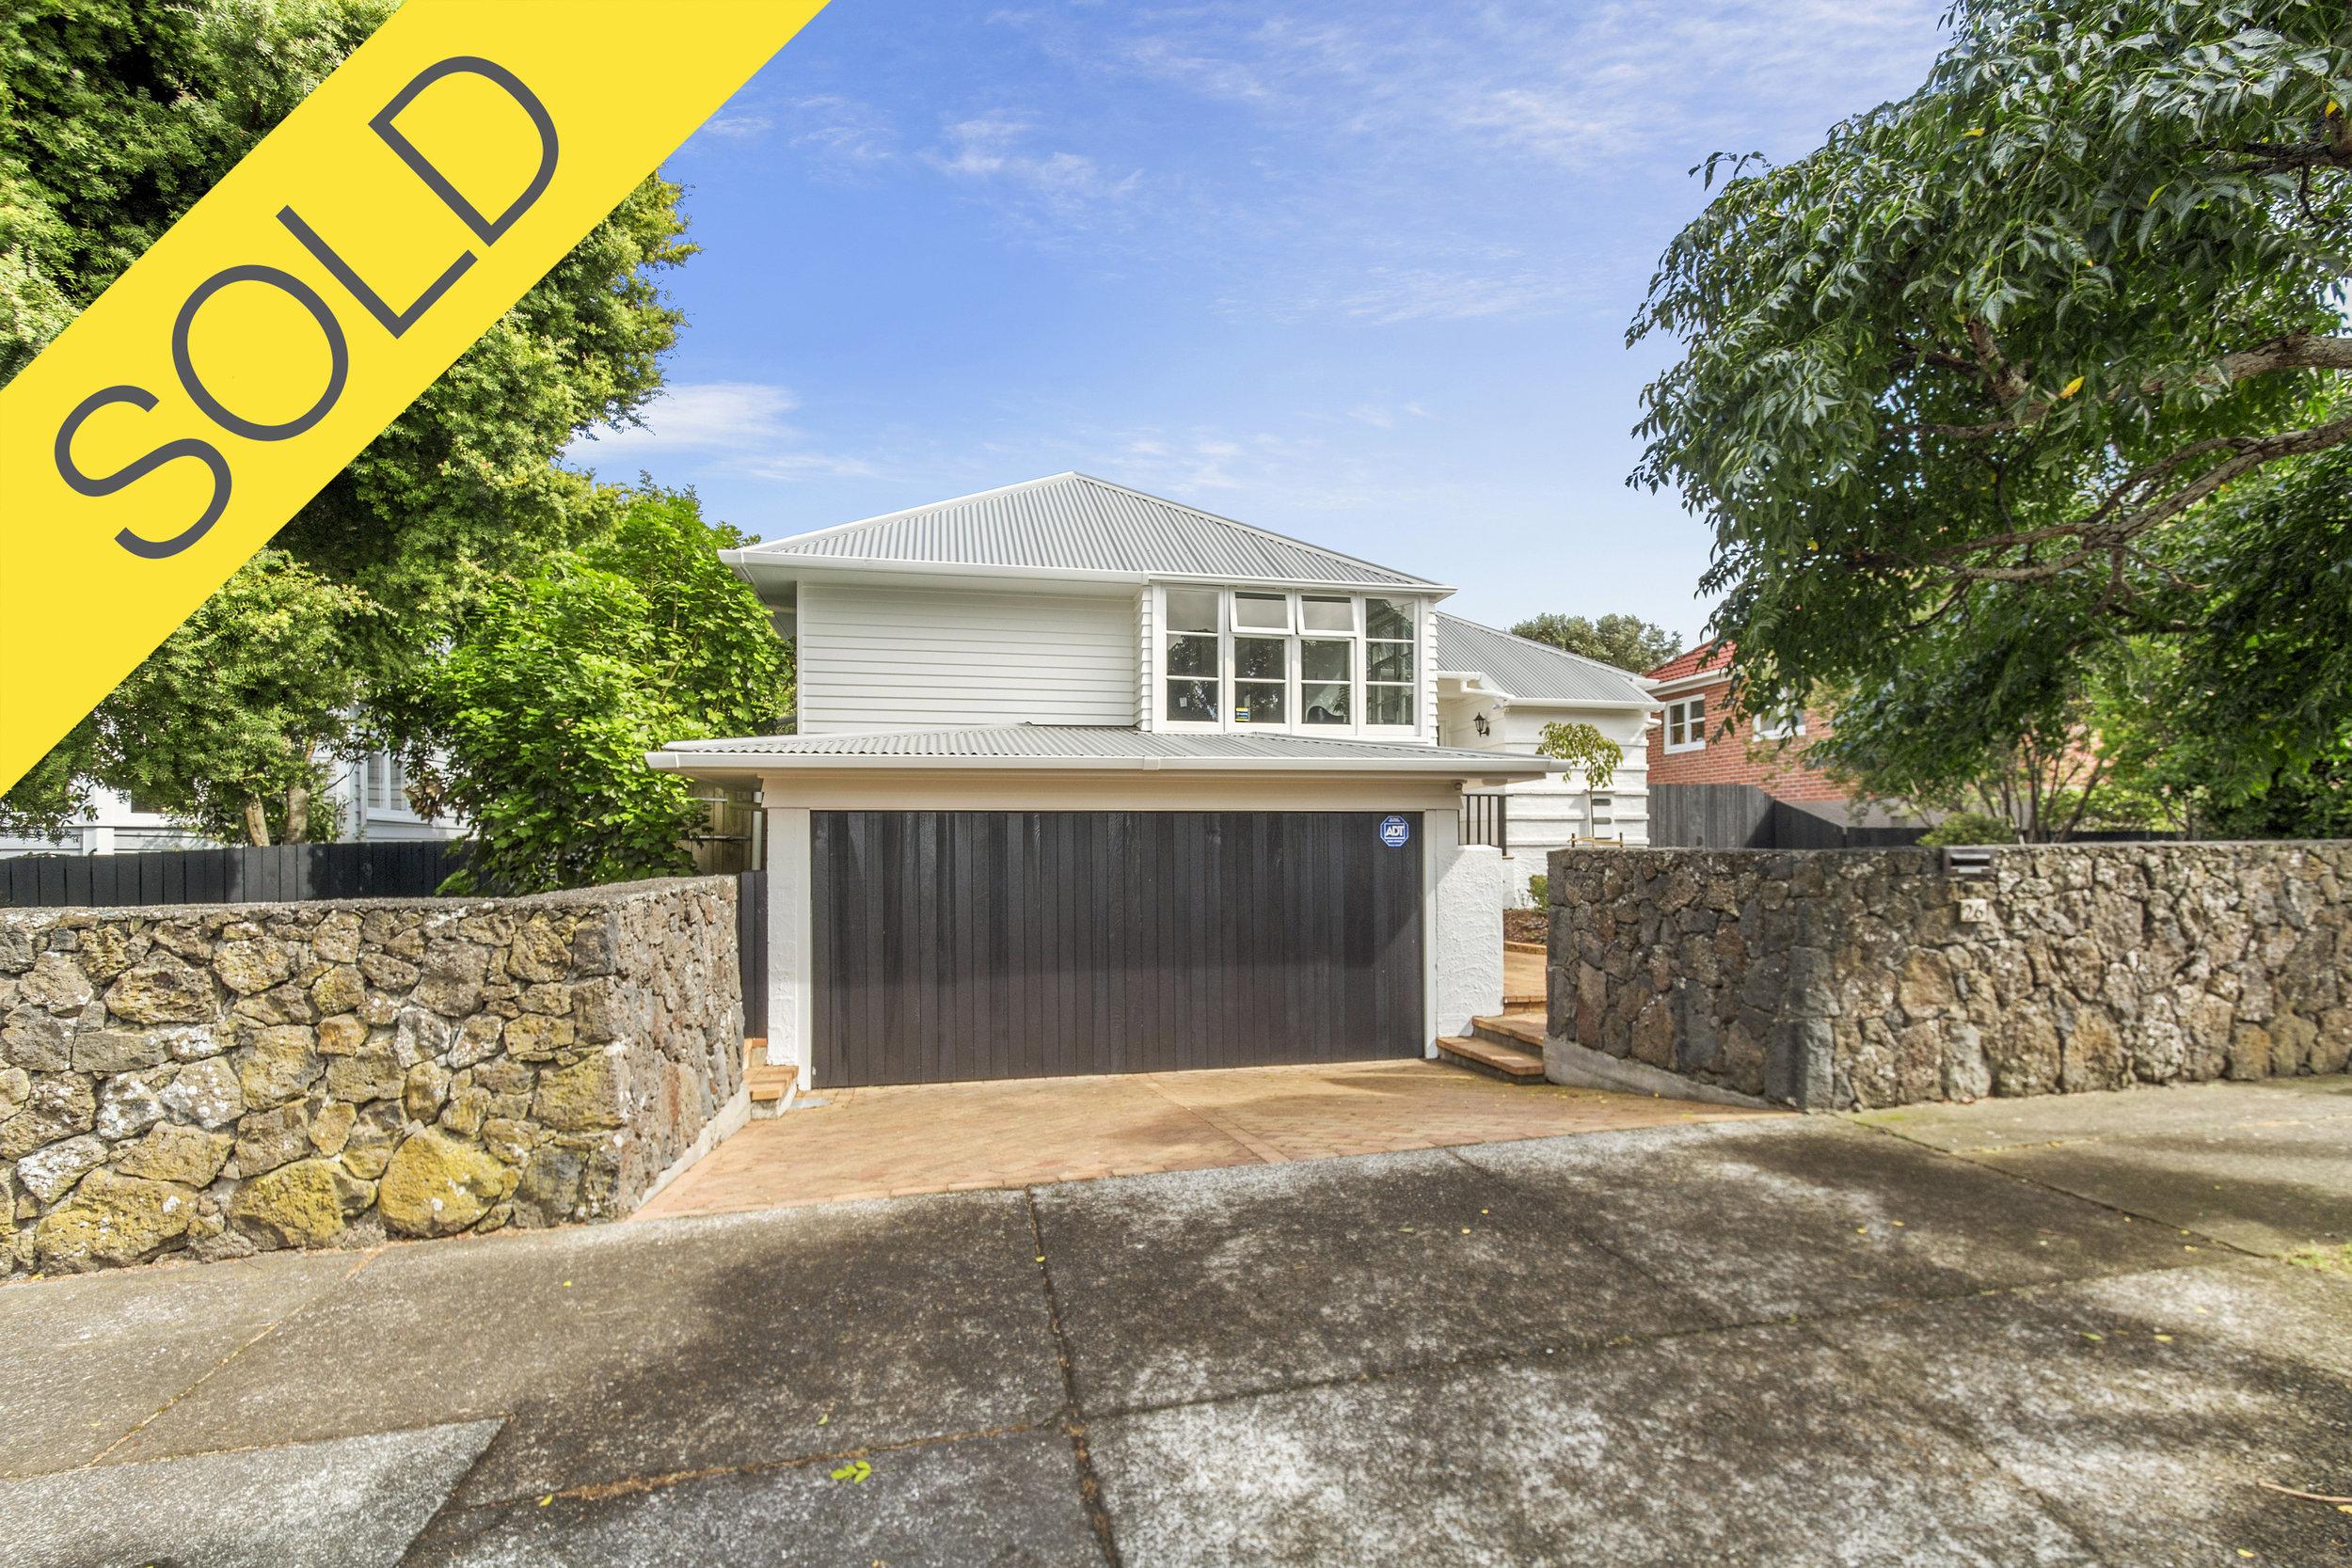 26 Athens Road, Onehunga, Auckland - SOLD APRIL 20183 Beds | 1 Bath | 2 Parking